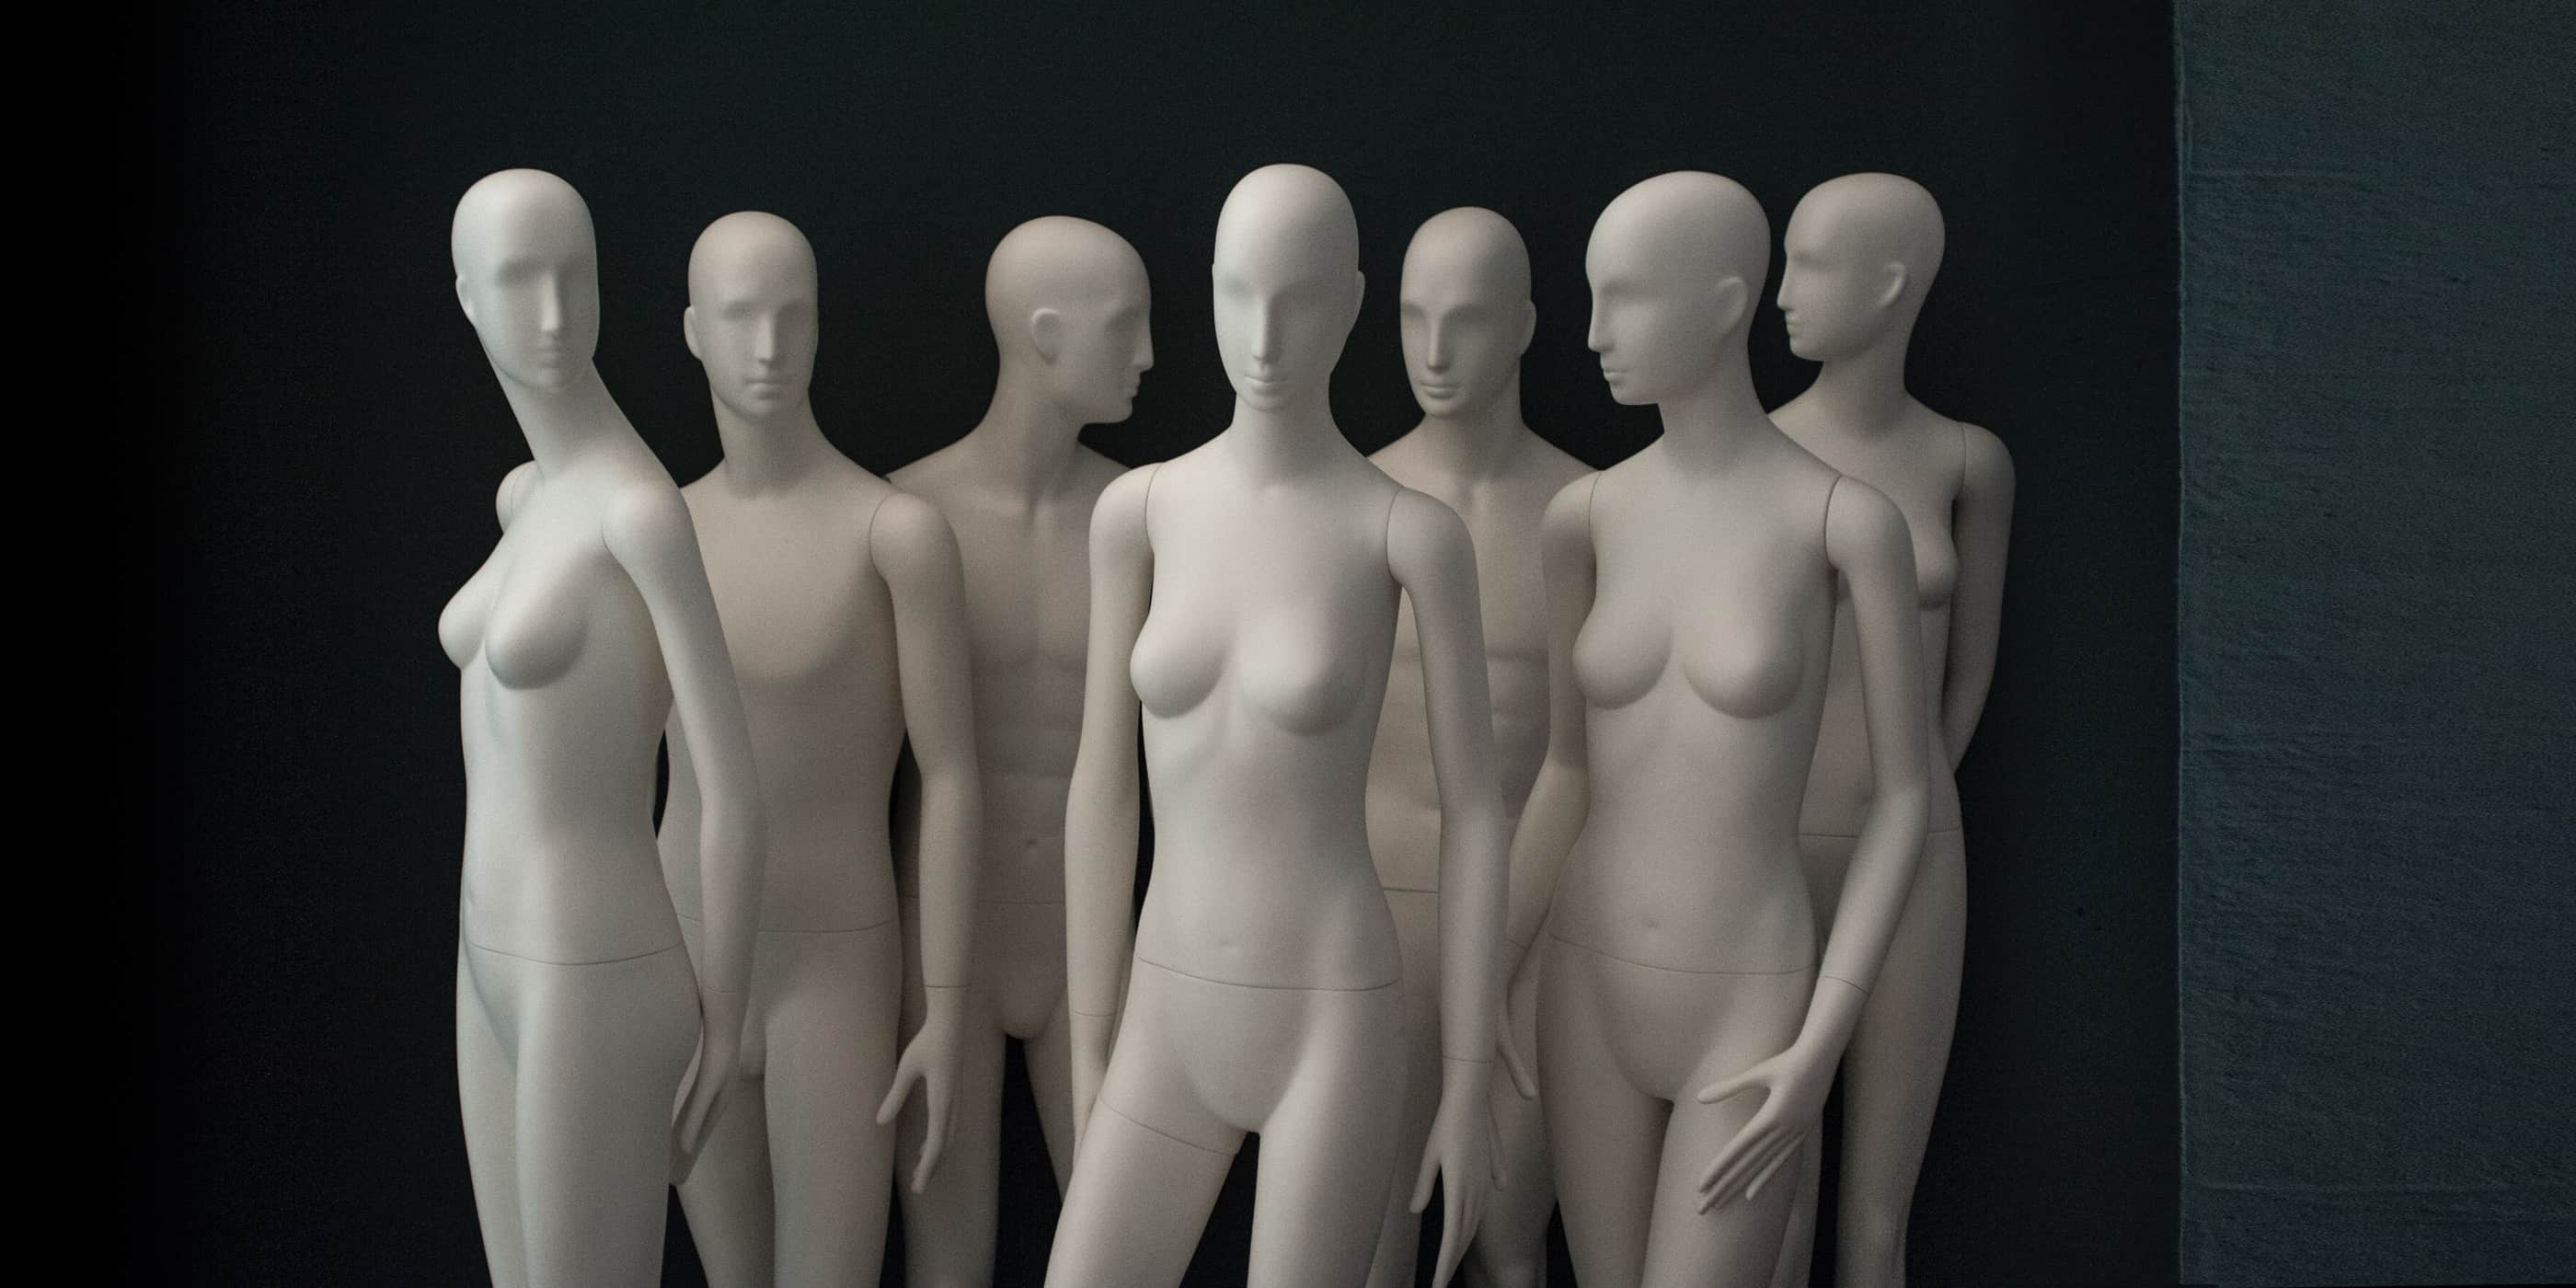 2000 3200 mannequins 10